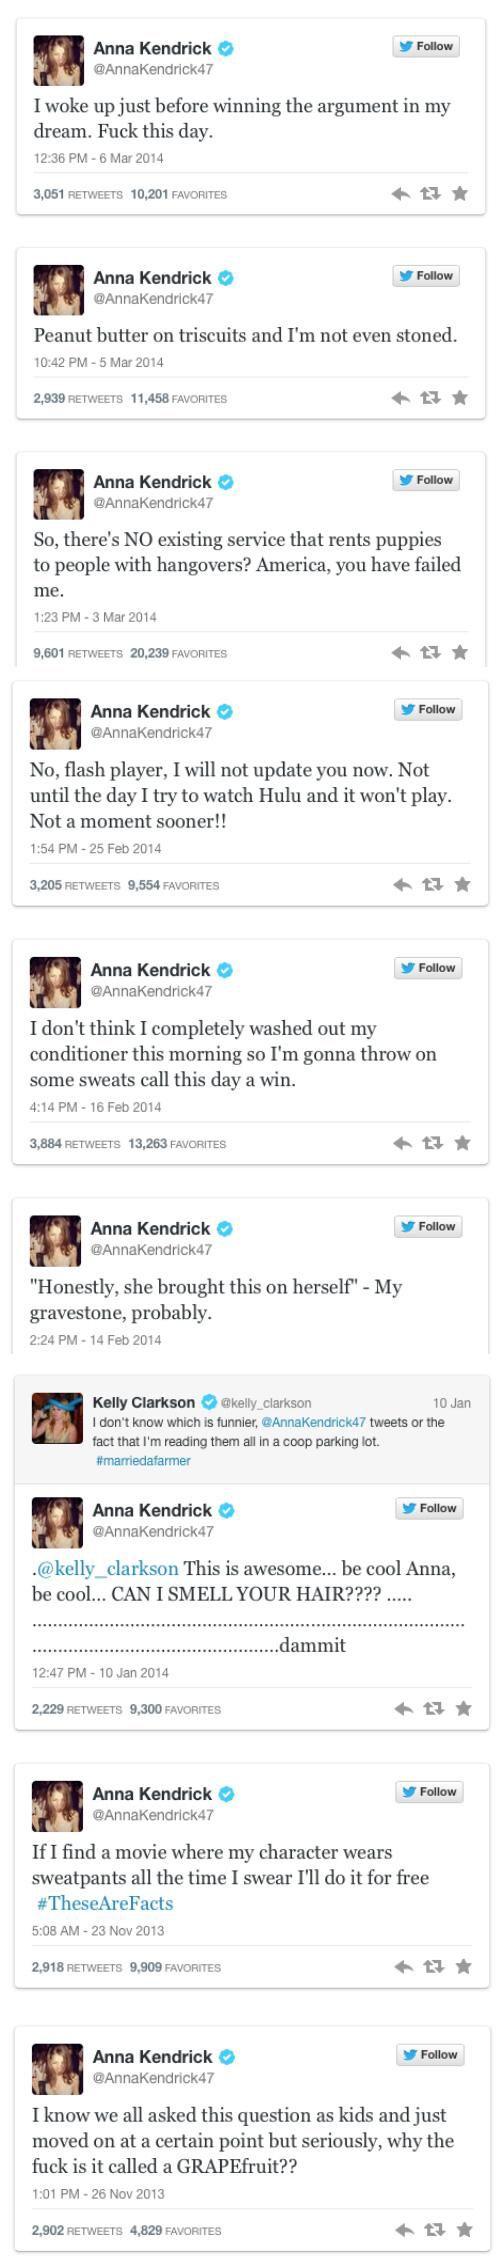 More Anna Kendrick Tweets